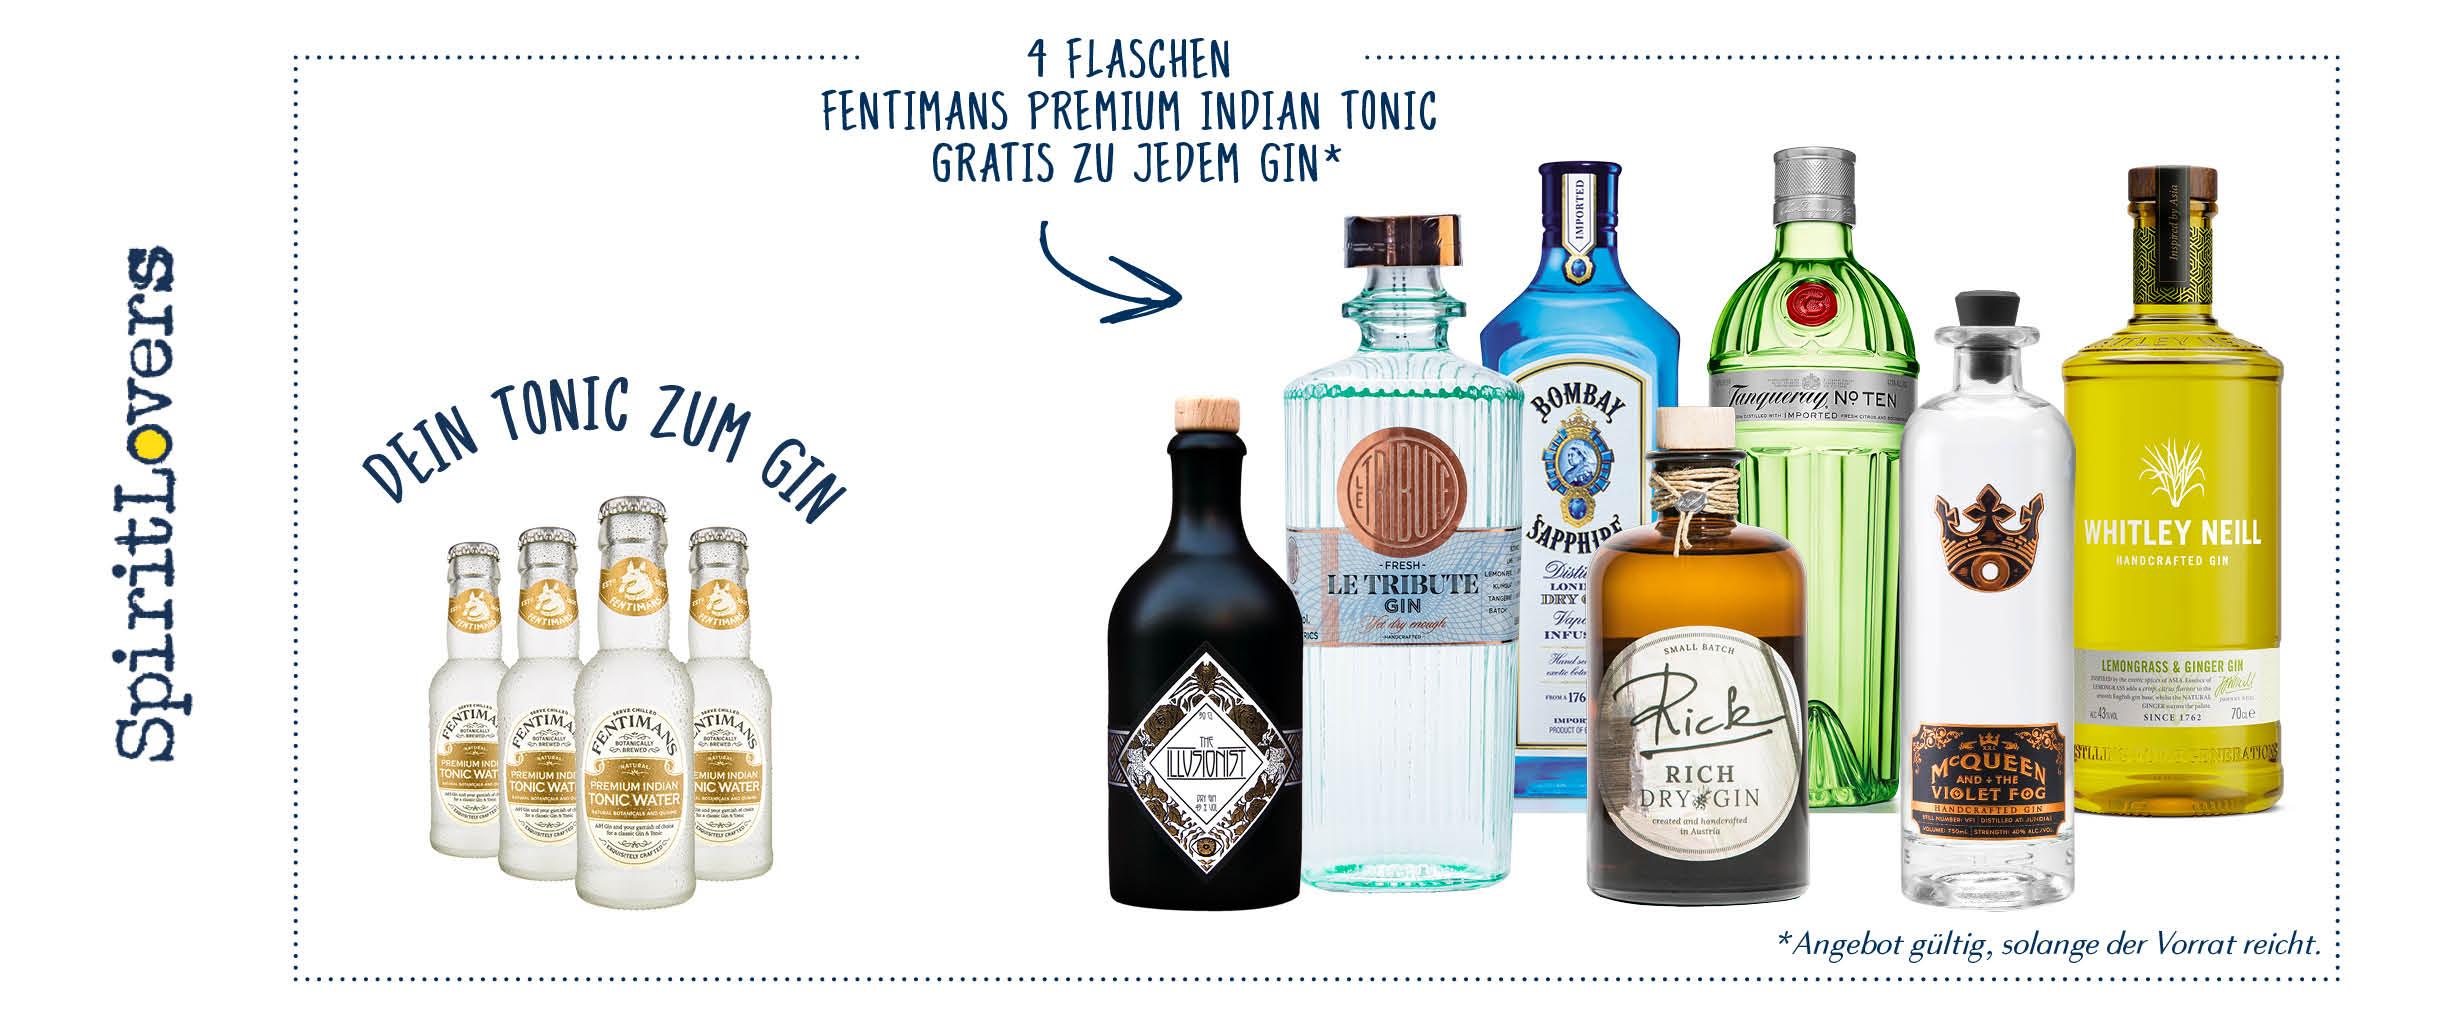 A7 - Fentimans Tonic gratis zu Gin